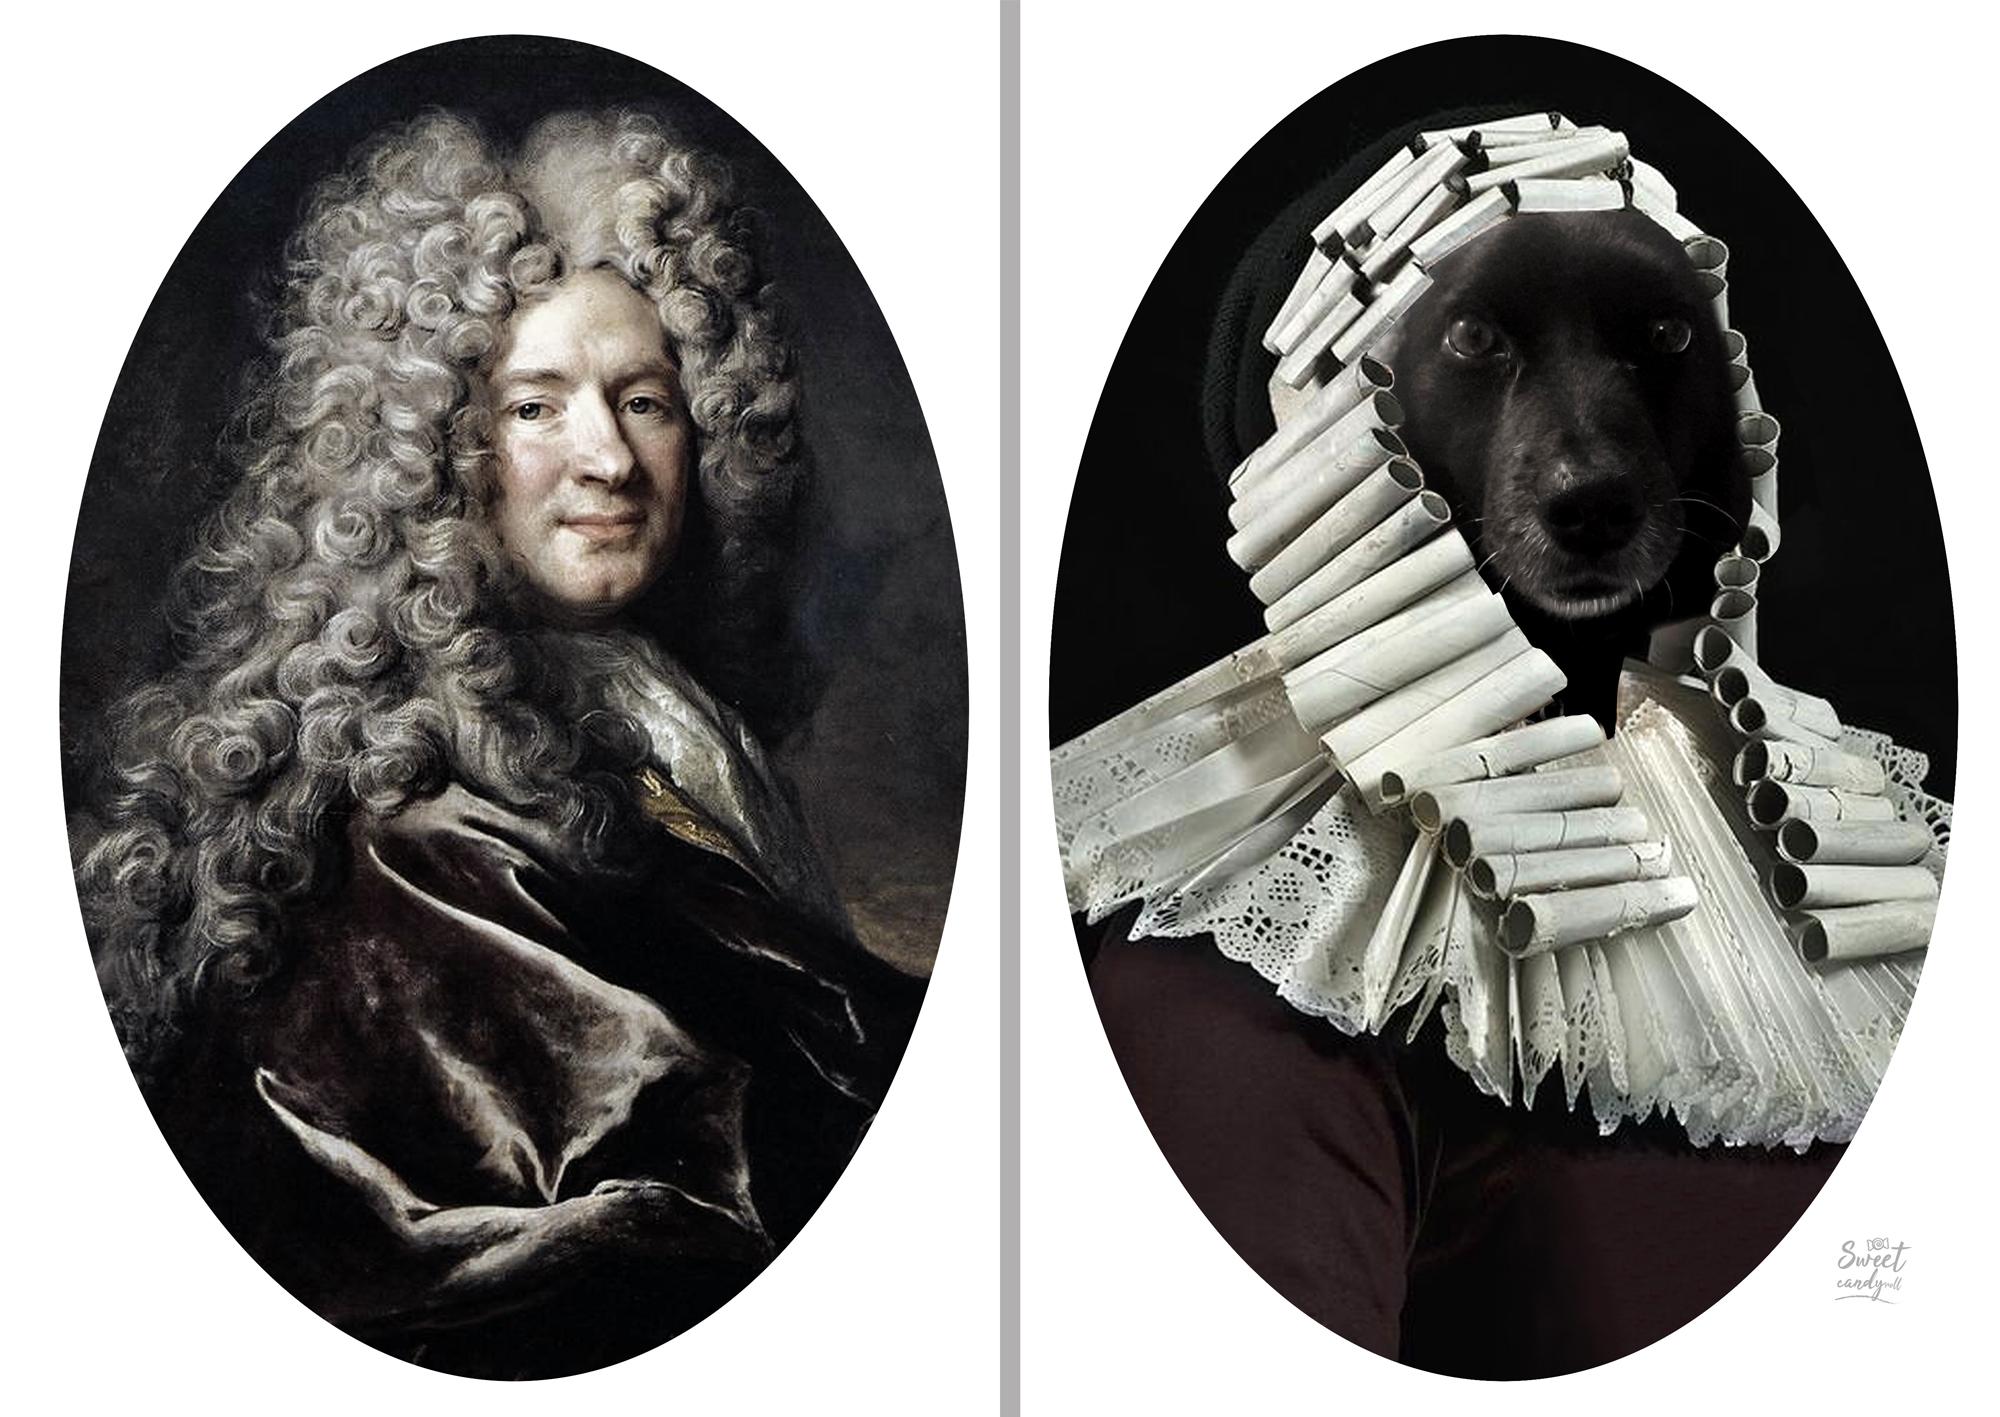 Nicolas-De-Largilliere-Ritratto-dog